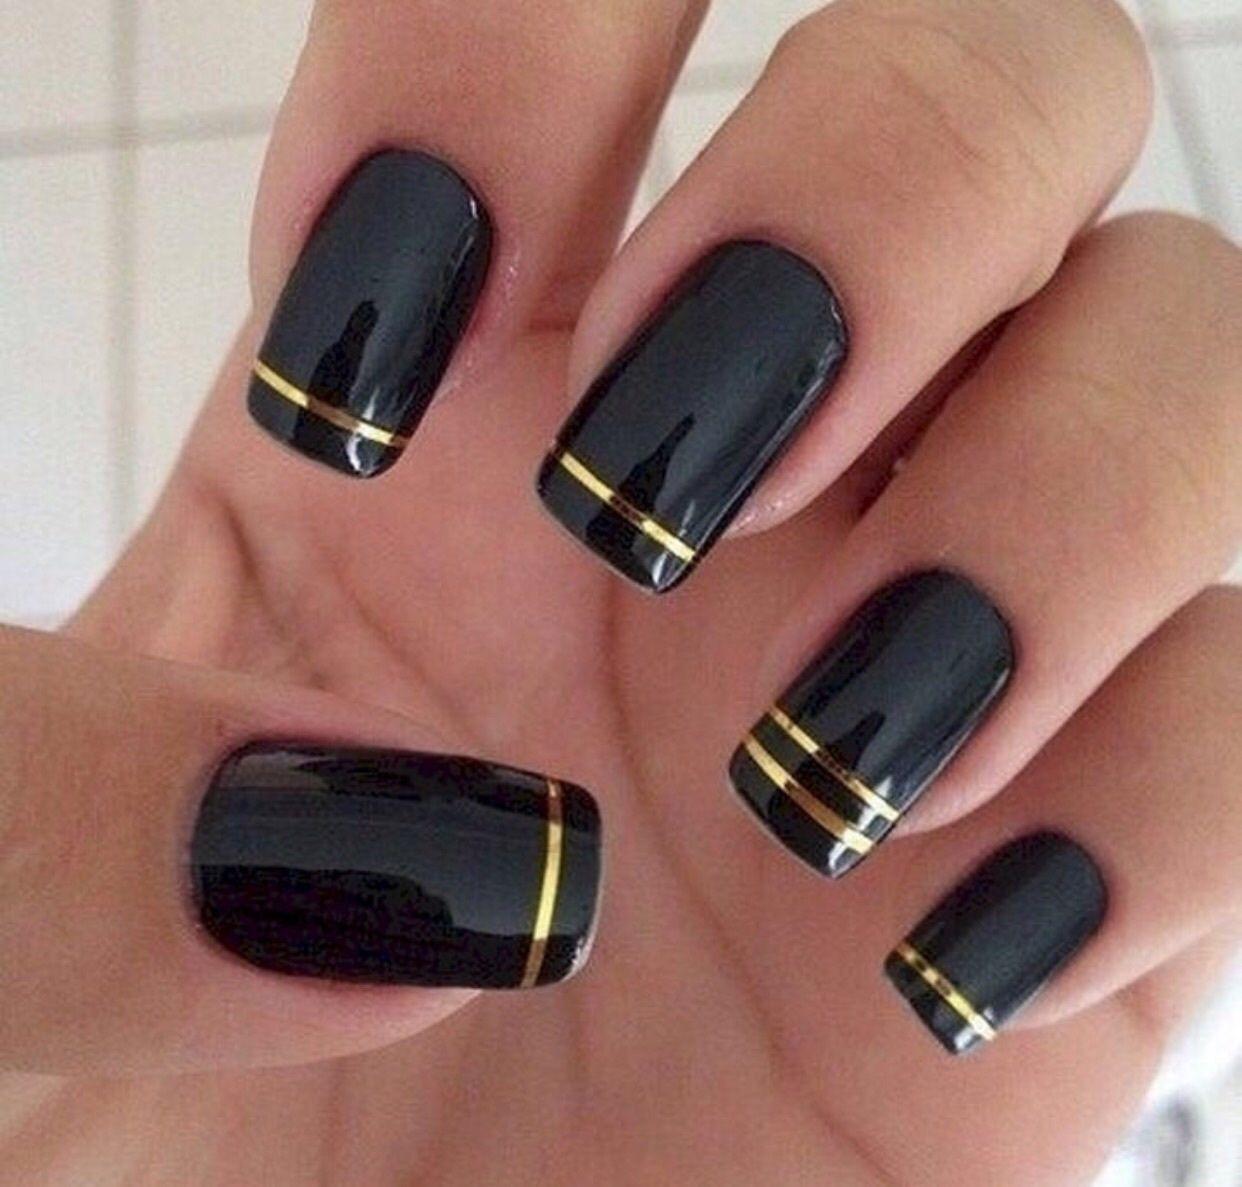 Unghii Negre 2018 Unghii în 2019 Nails Black Acrylic Nails și